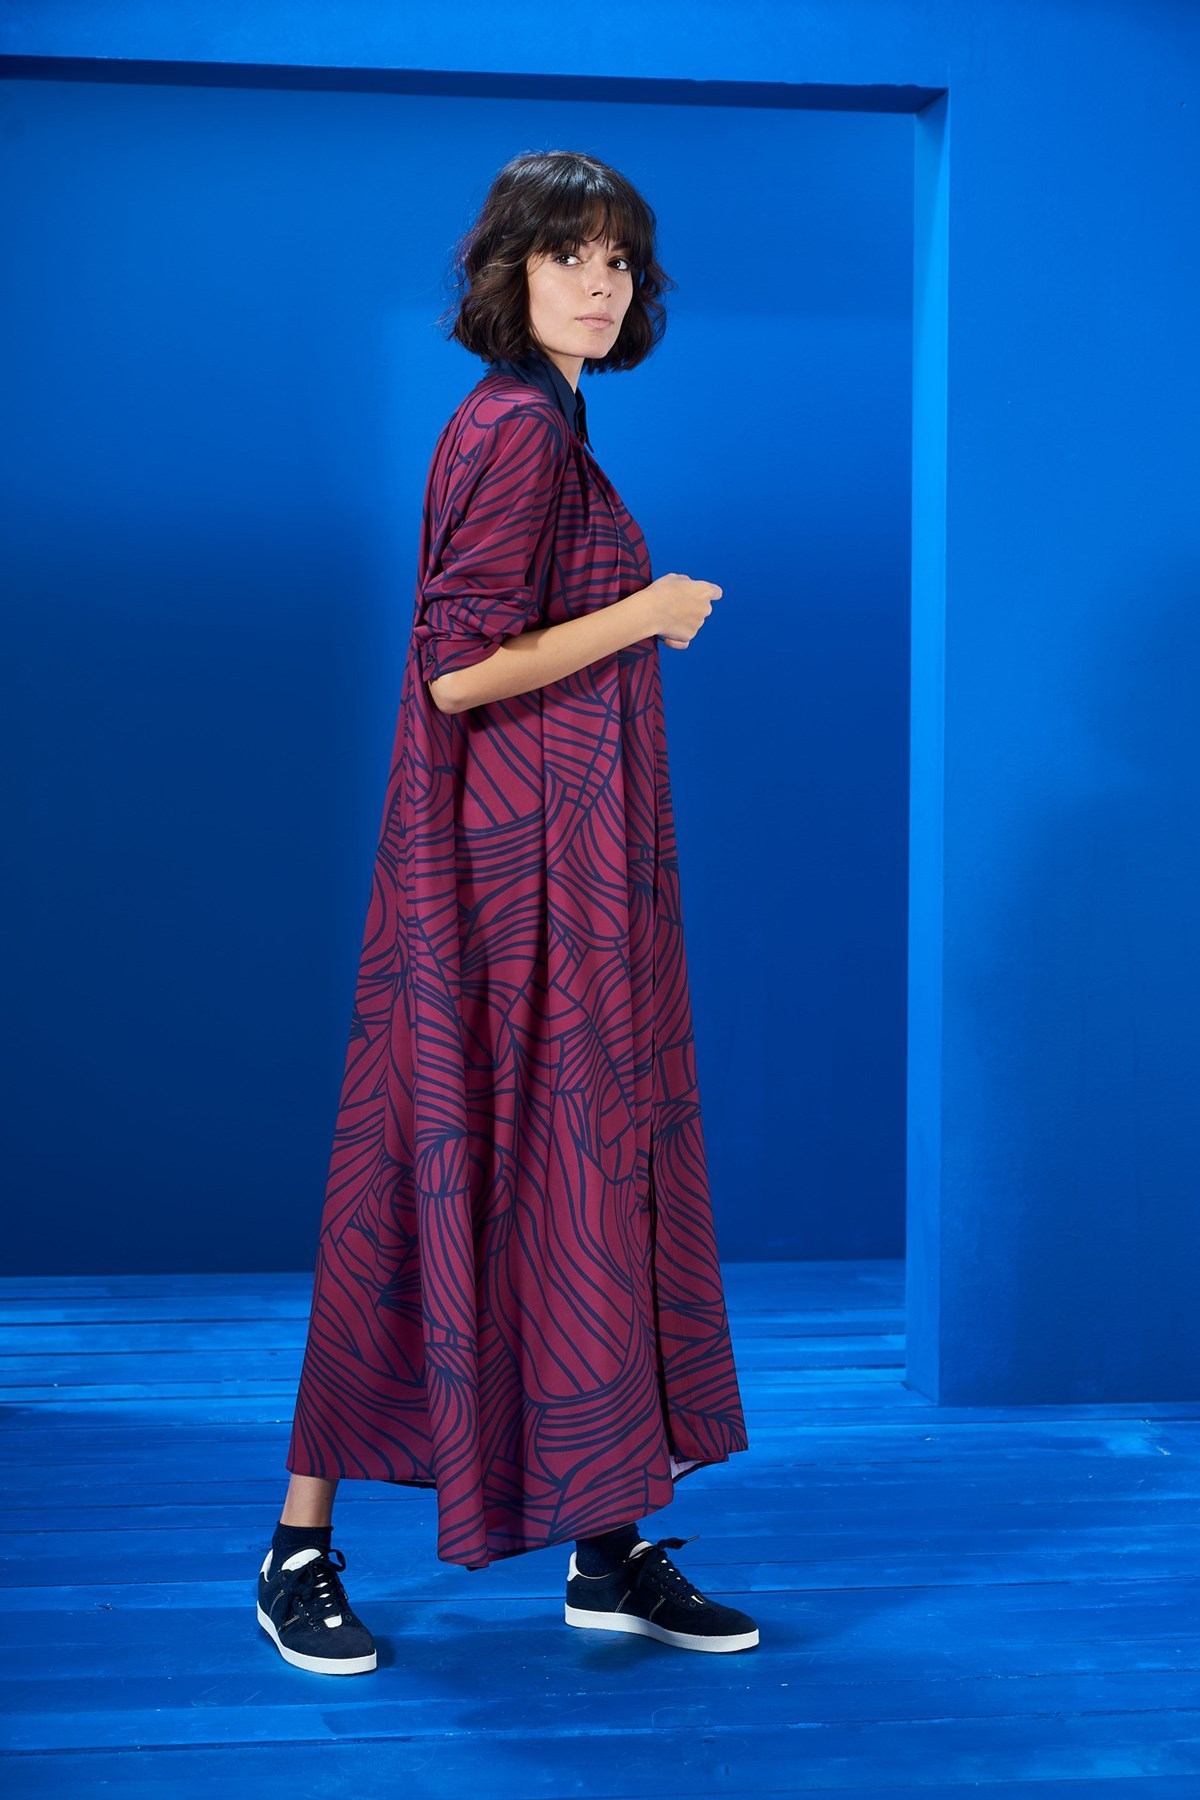 Mevra - Yaka Detay Elbise Desenli Vişne-Laci